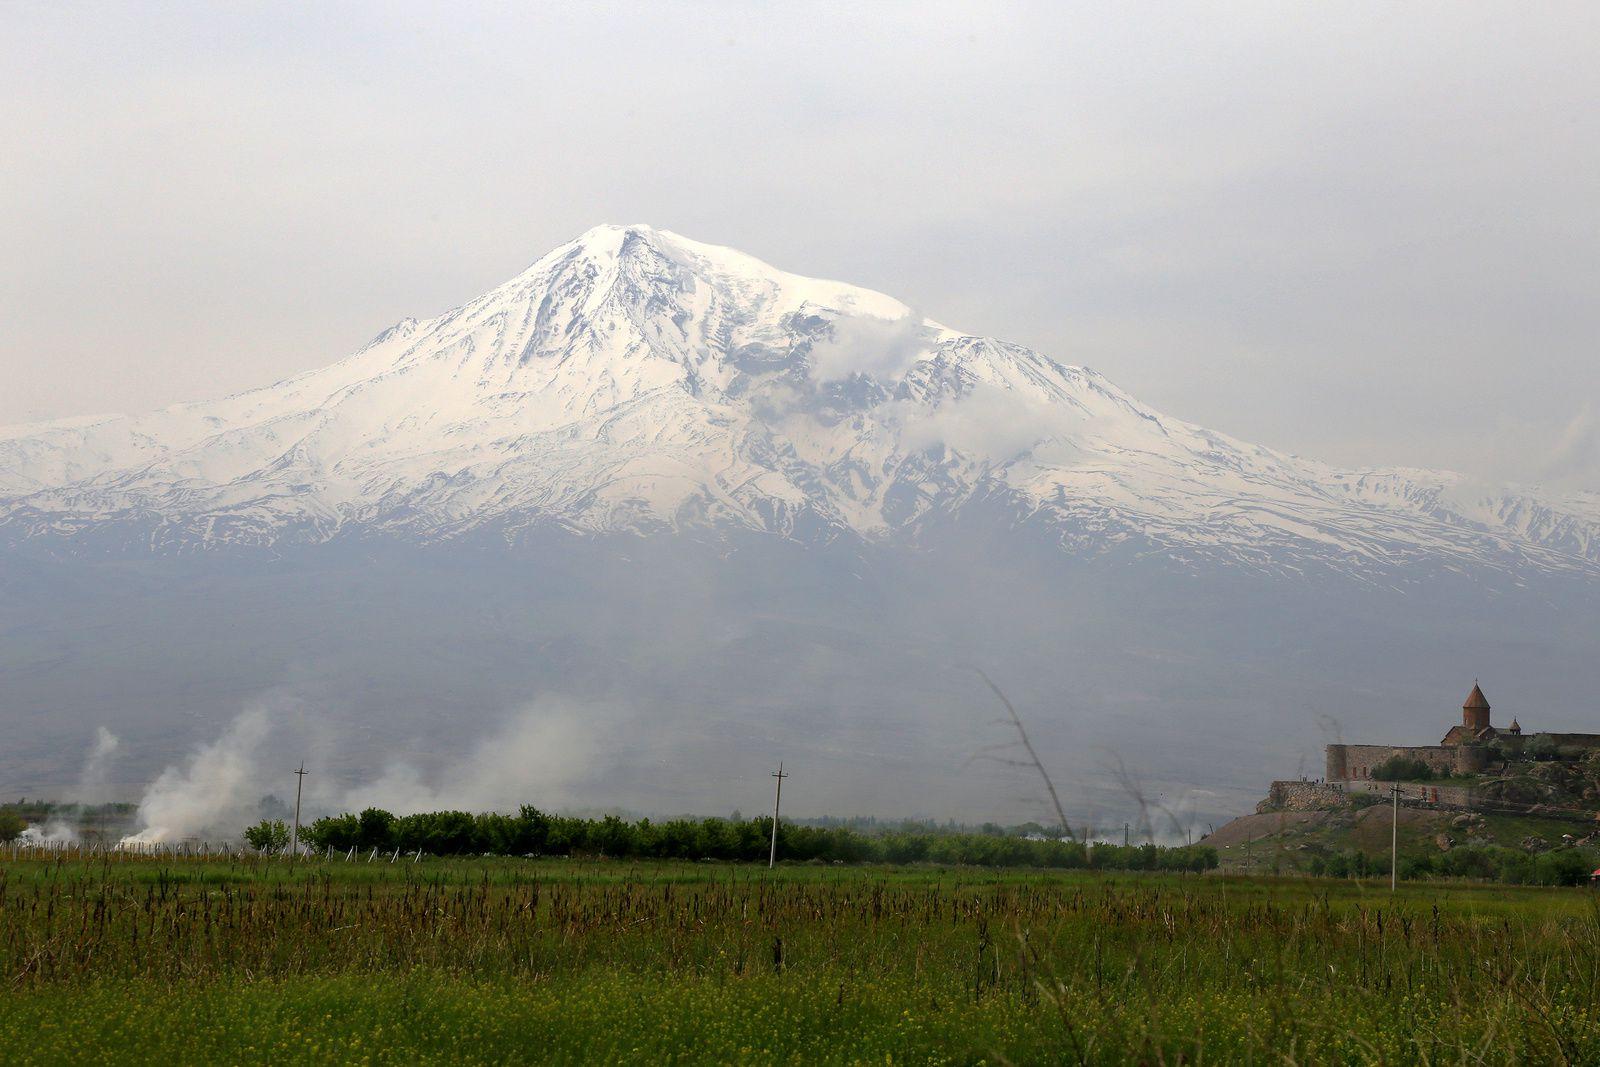 Le monastère de Khor Virap et la Grand Ararat - photo © Bernard Duyck 2019